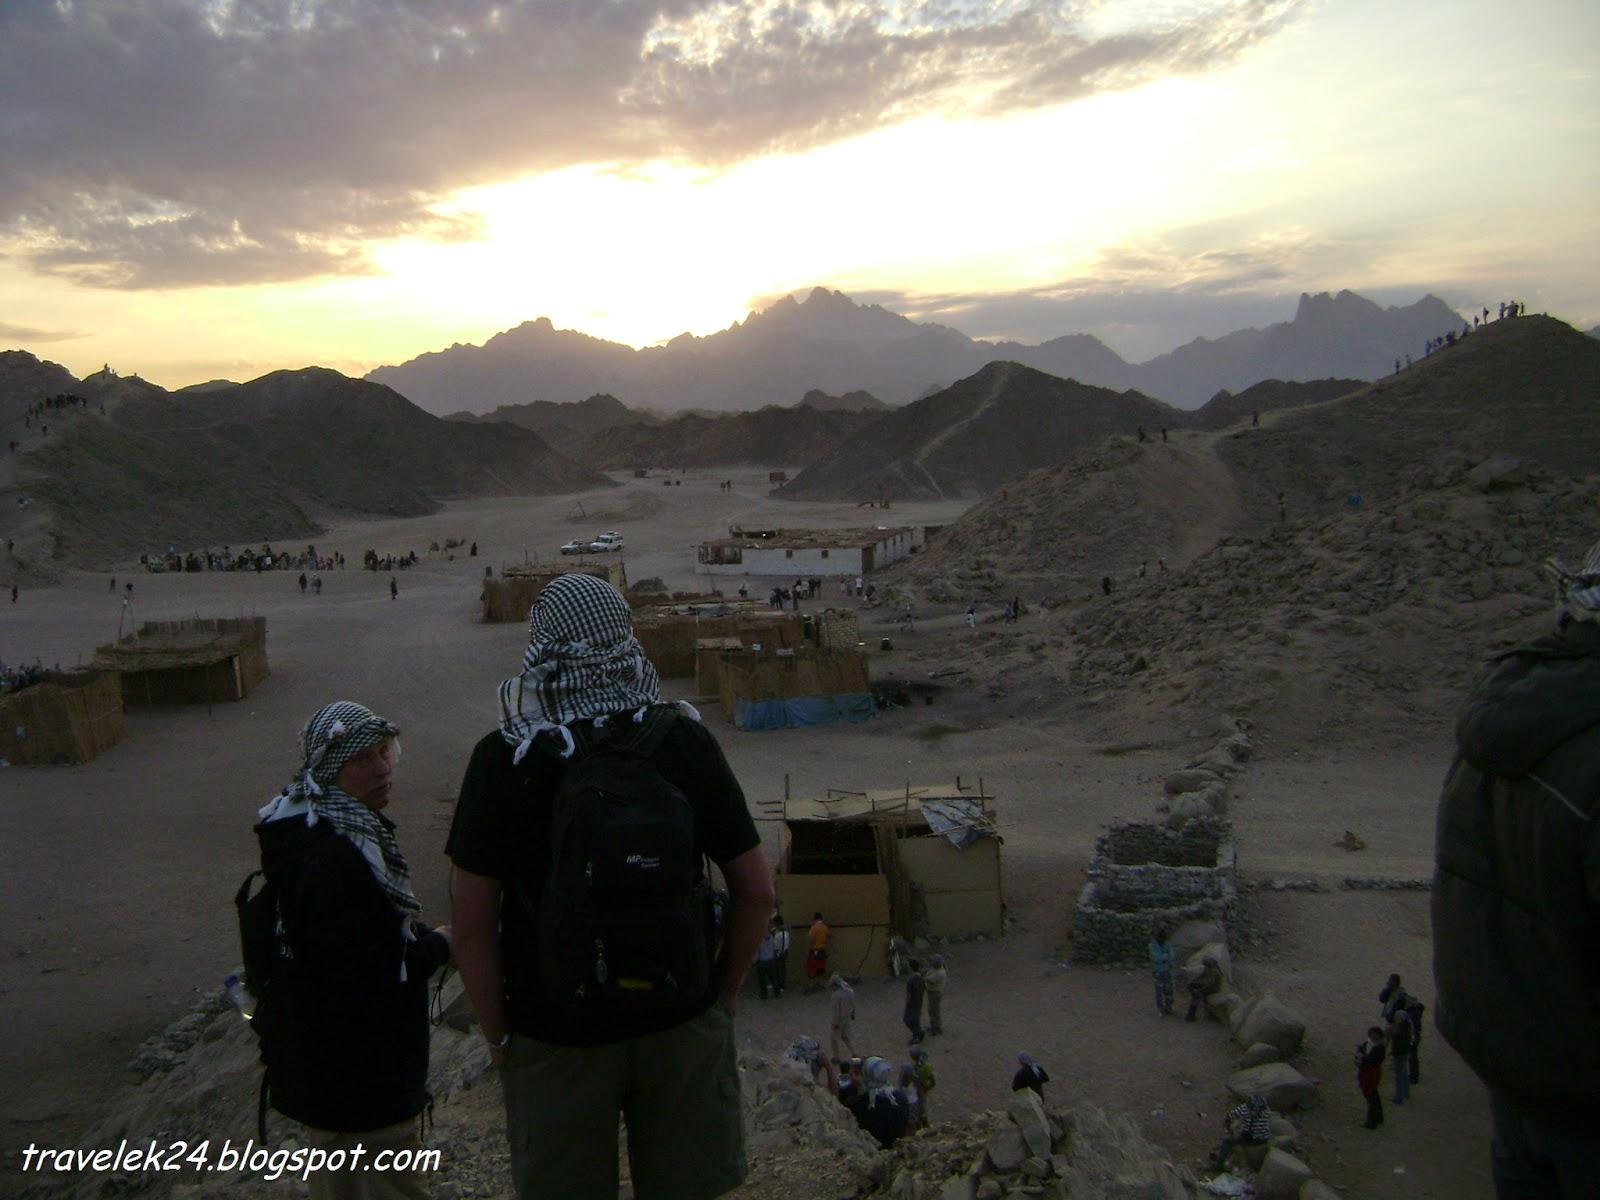 Wioska Beduinów, Quad Safari, Hurghada Egipt